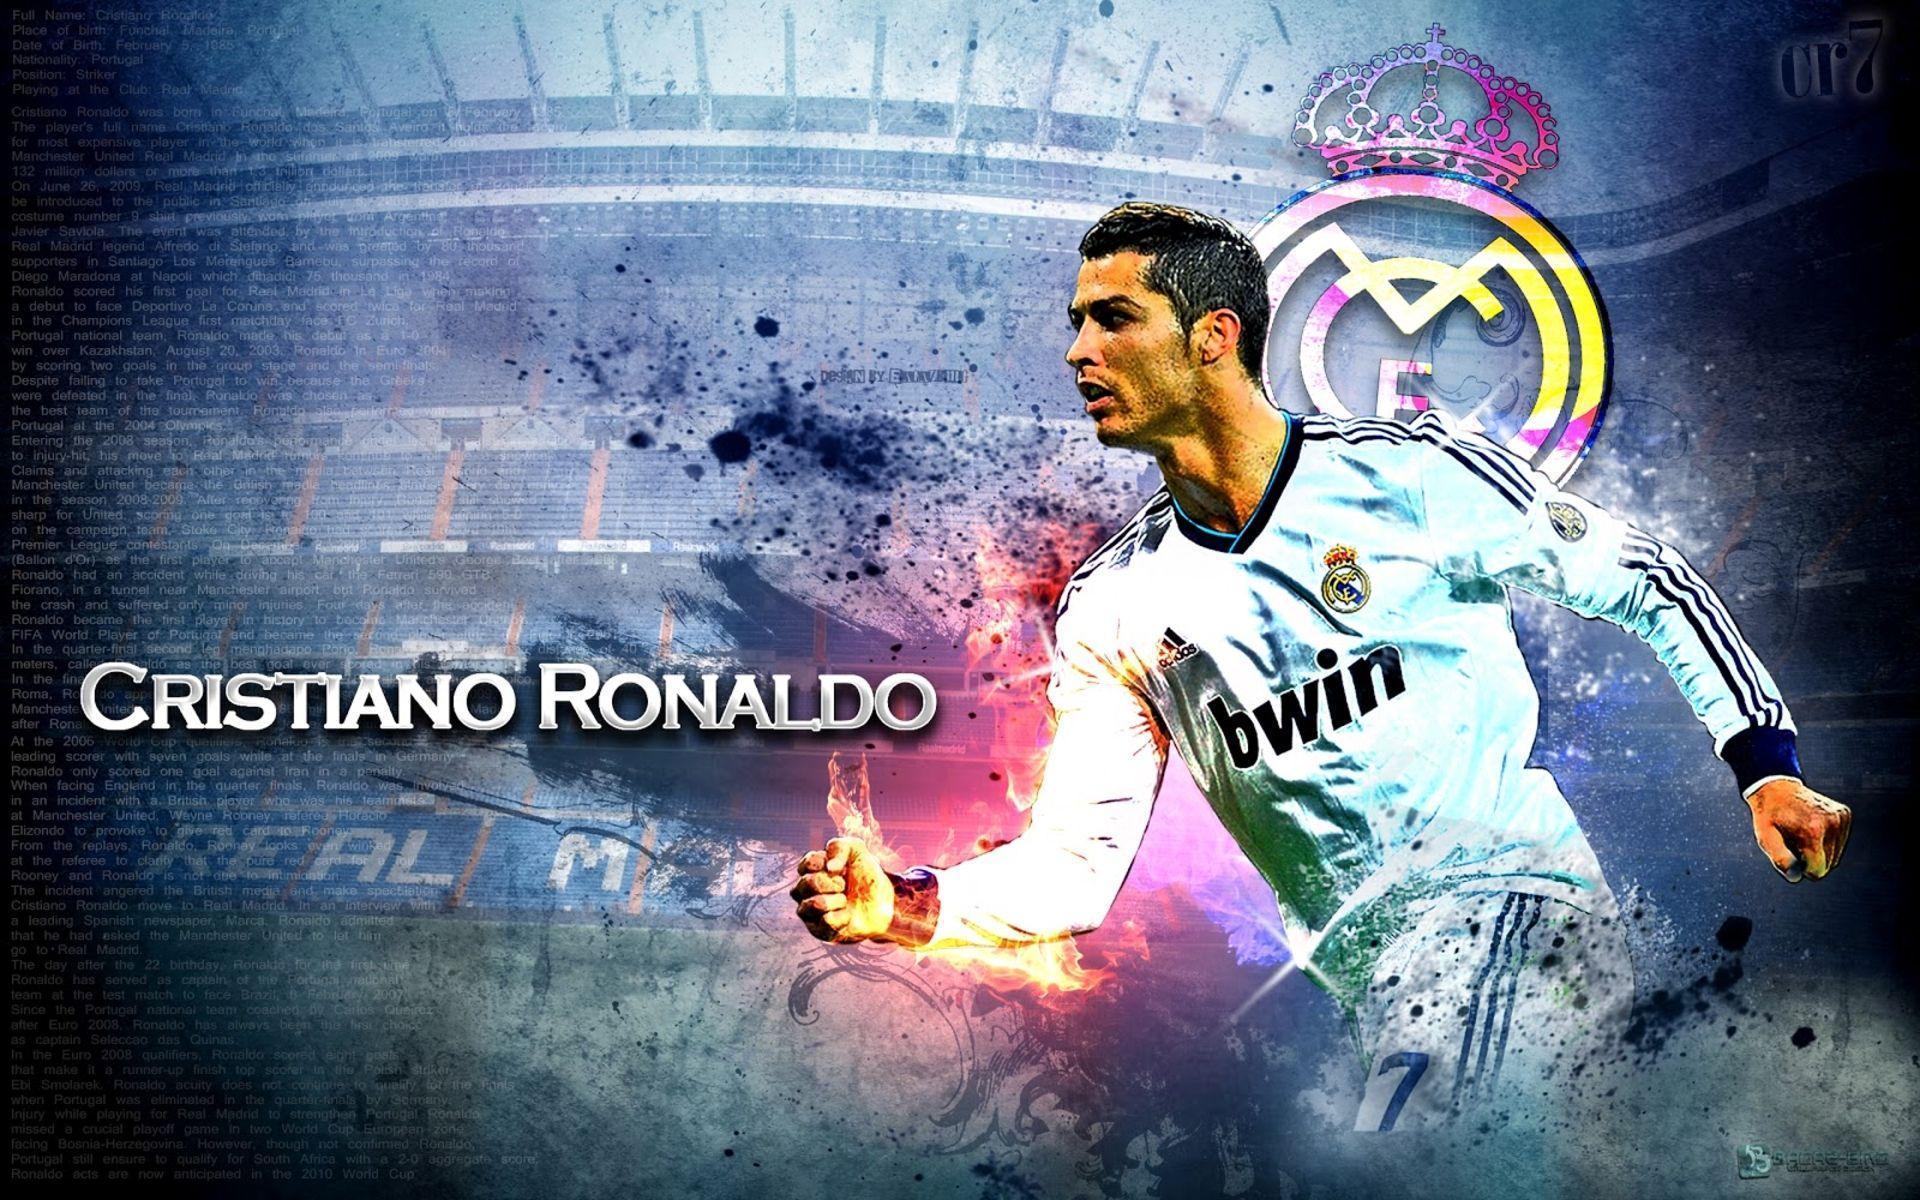 Cristiano Ronaldo HD Wallpaper - HD Wallpapers